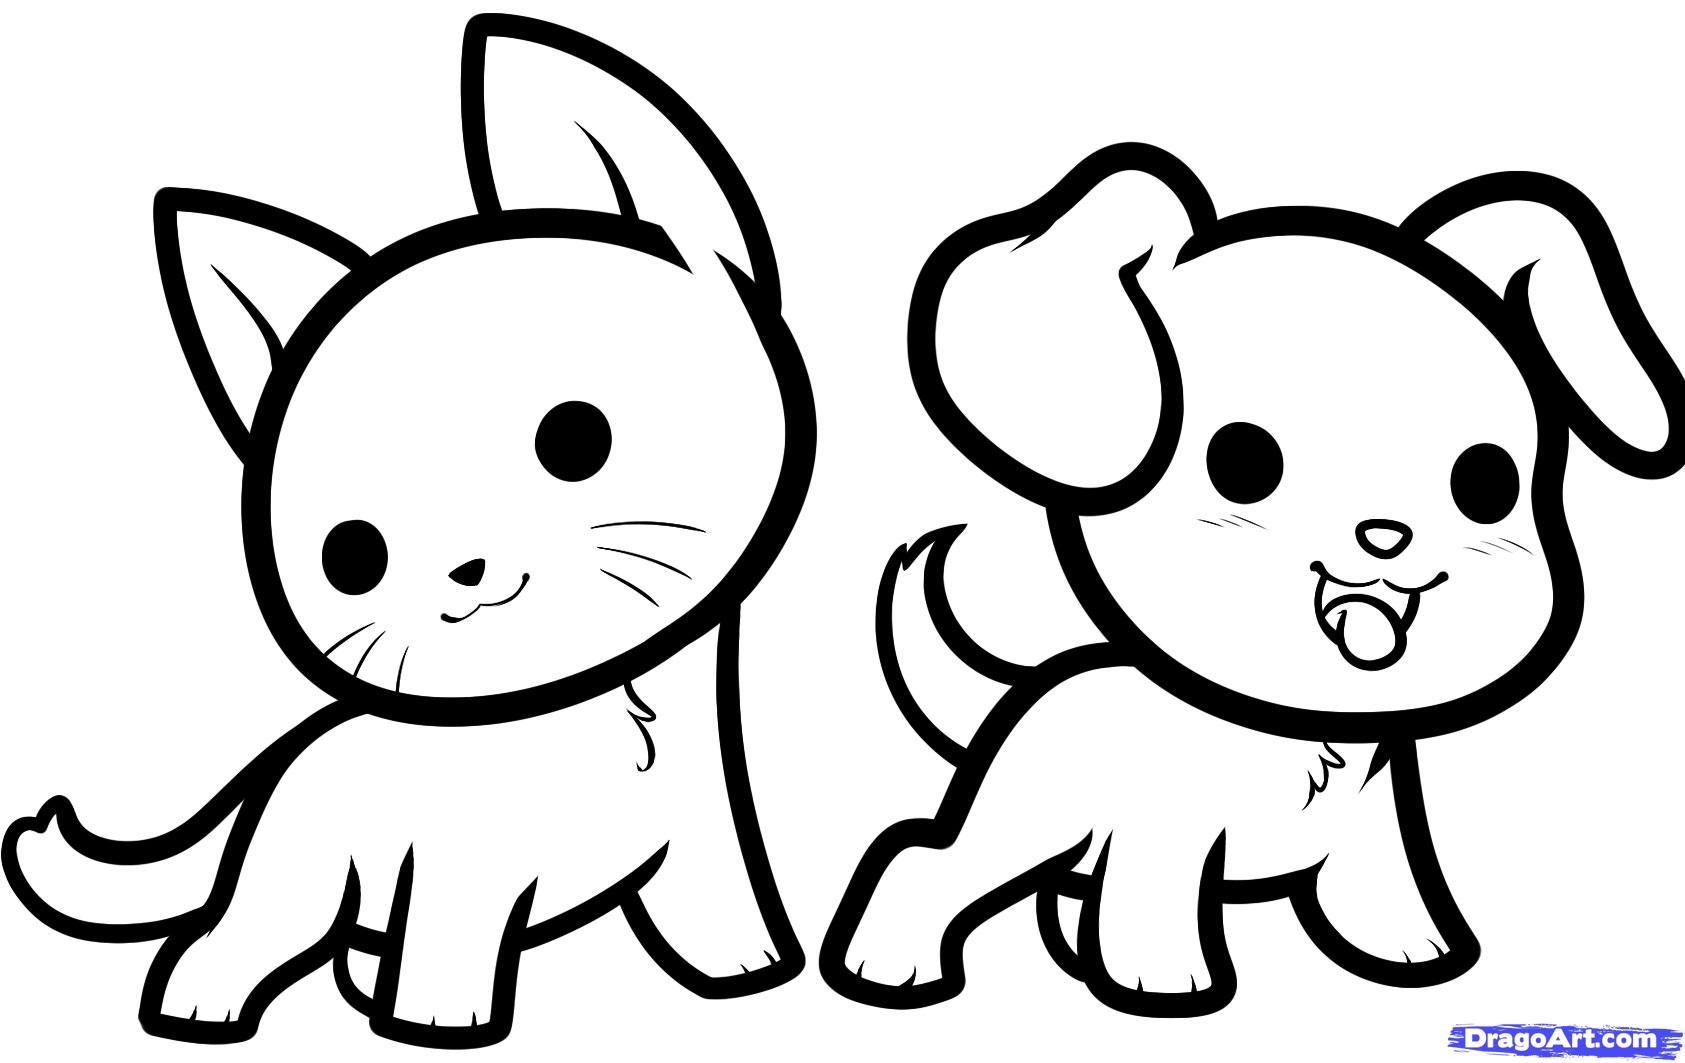 How To Draw Kawaii Animals Step By Step Anime Animals Anime Draw Japanese Anime Draw Manga Free Baby Animal Drawings Easy Animal Drawings Animal Drawings